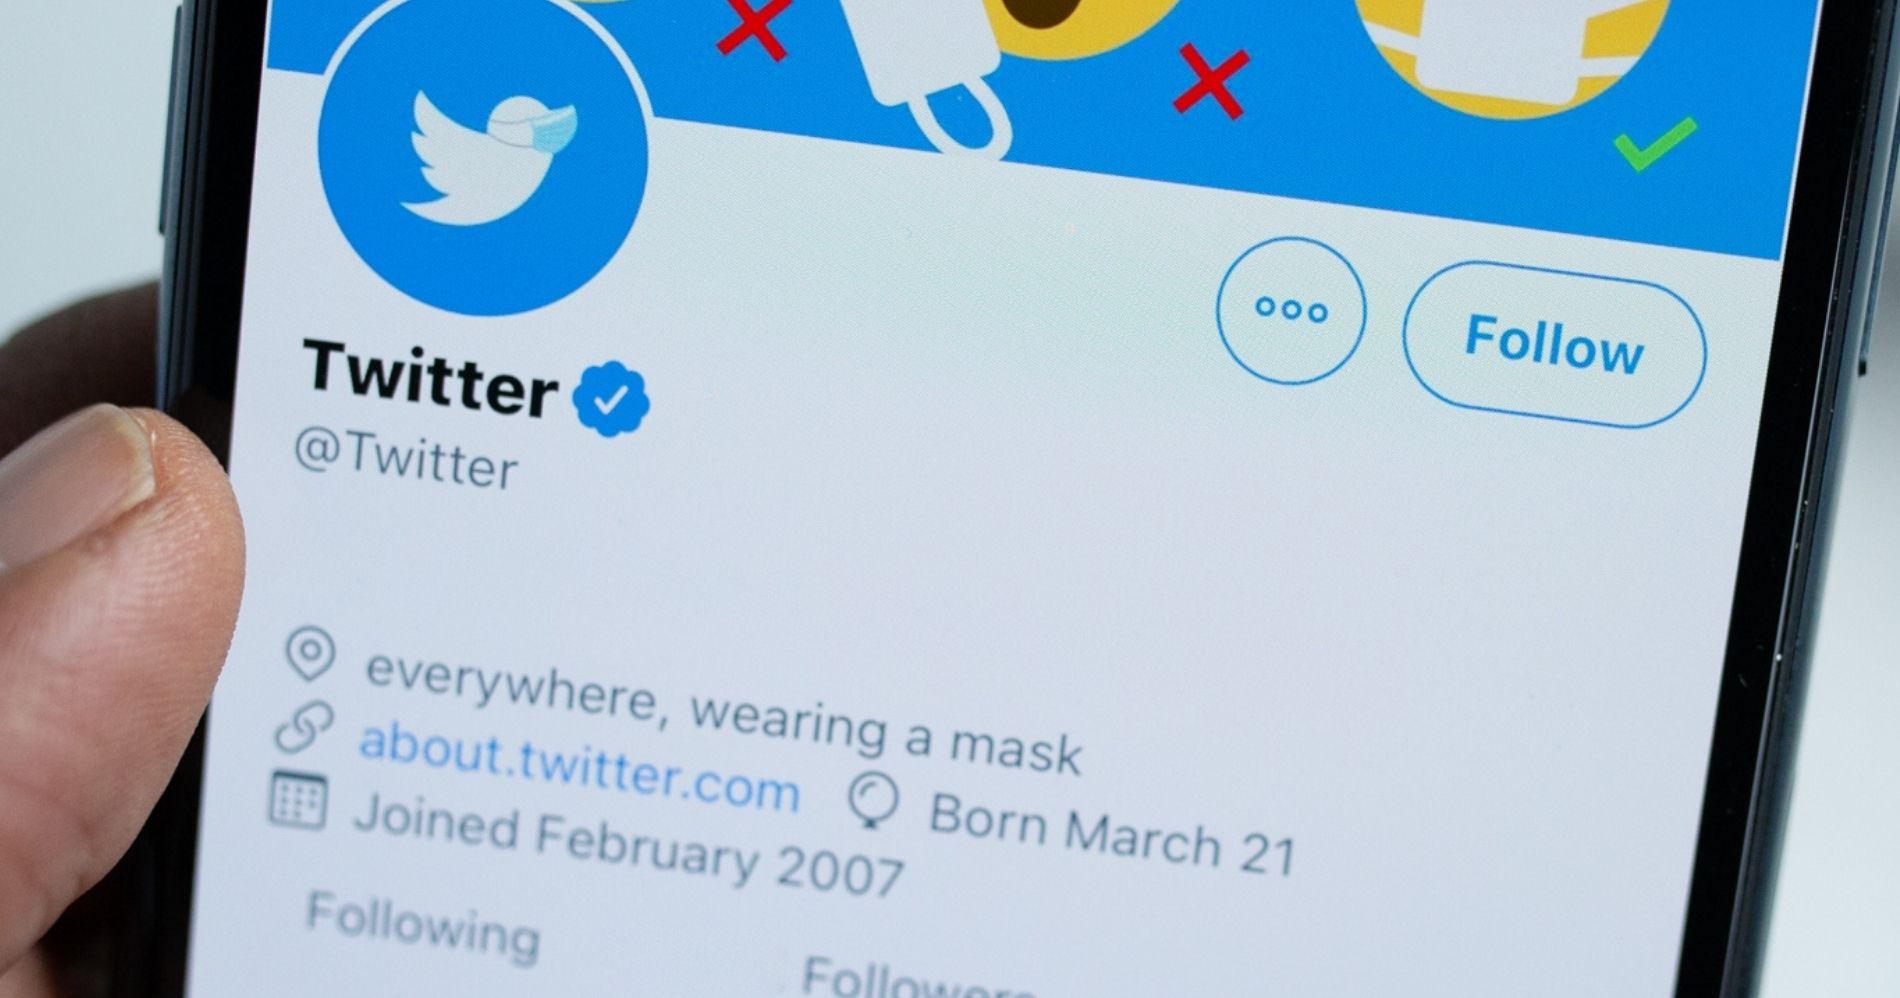 CEO Twitter Bakal Gunakan Bitcoin Illustration Bisnis Muda - Canva